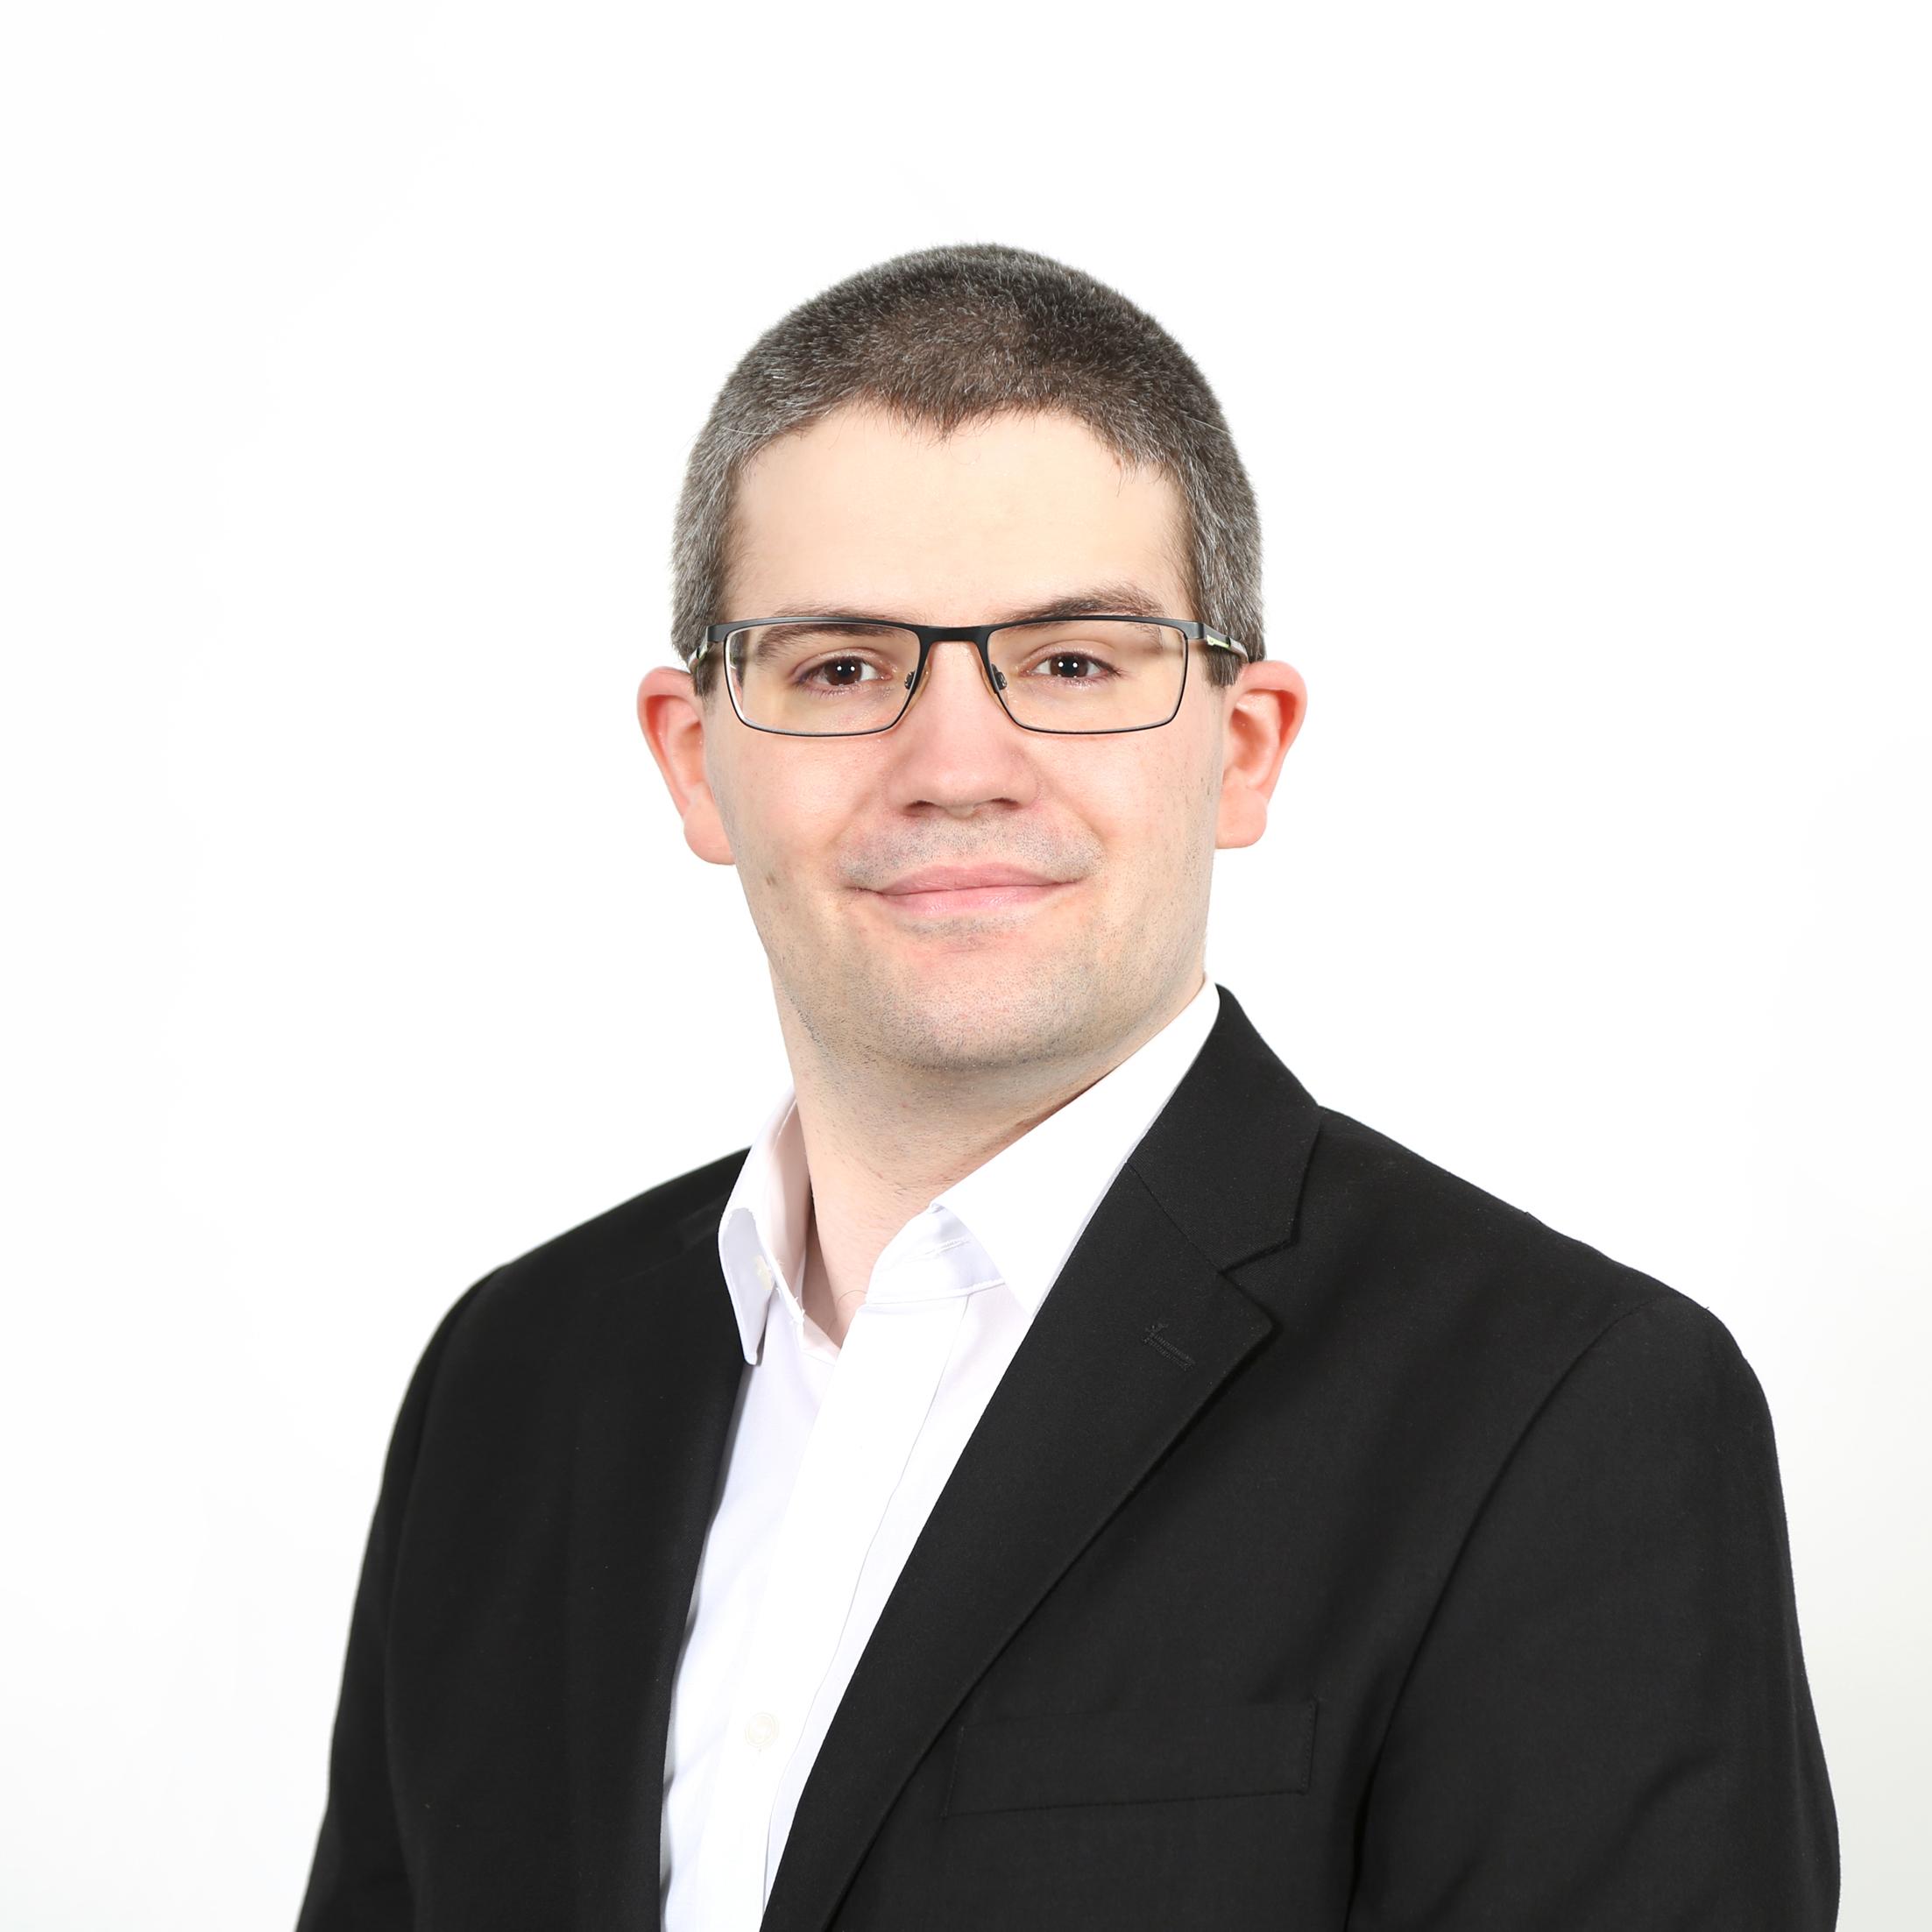 Dennis Irrgang